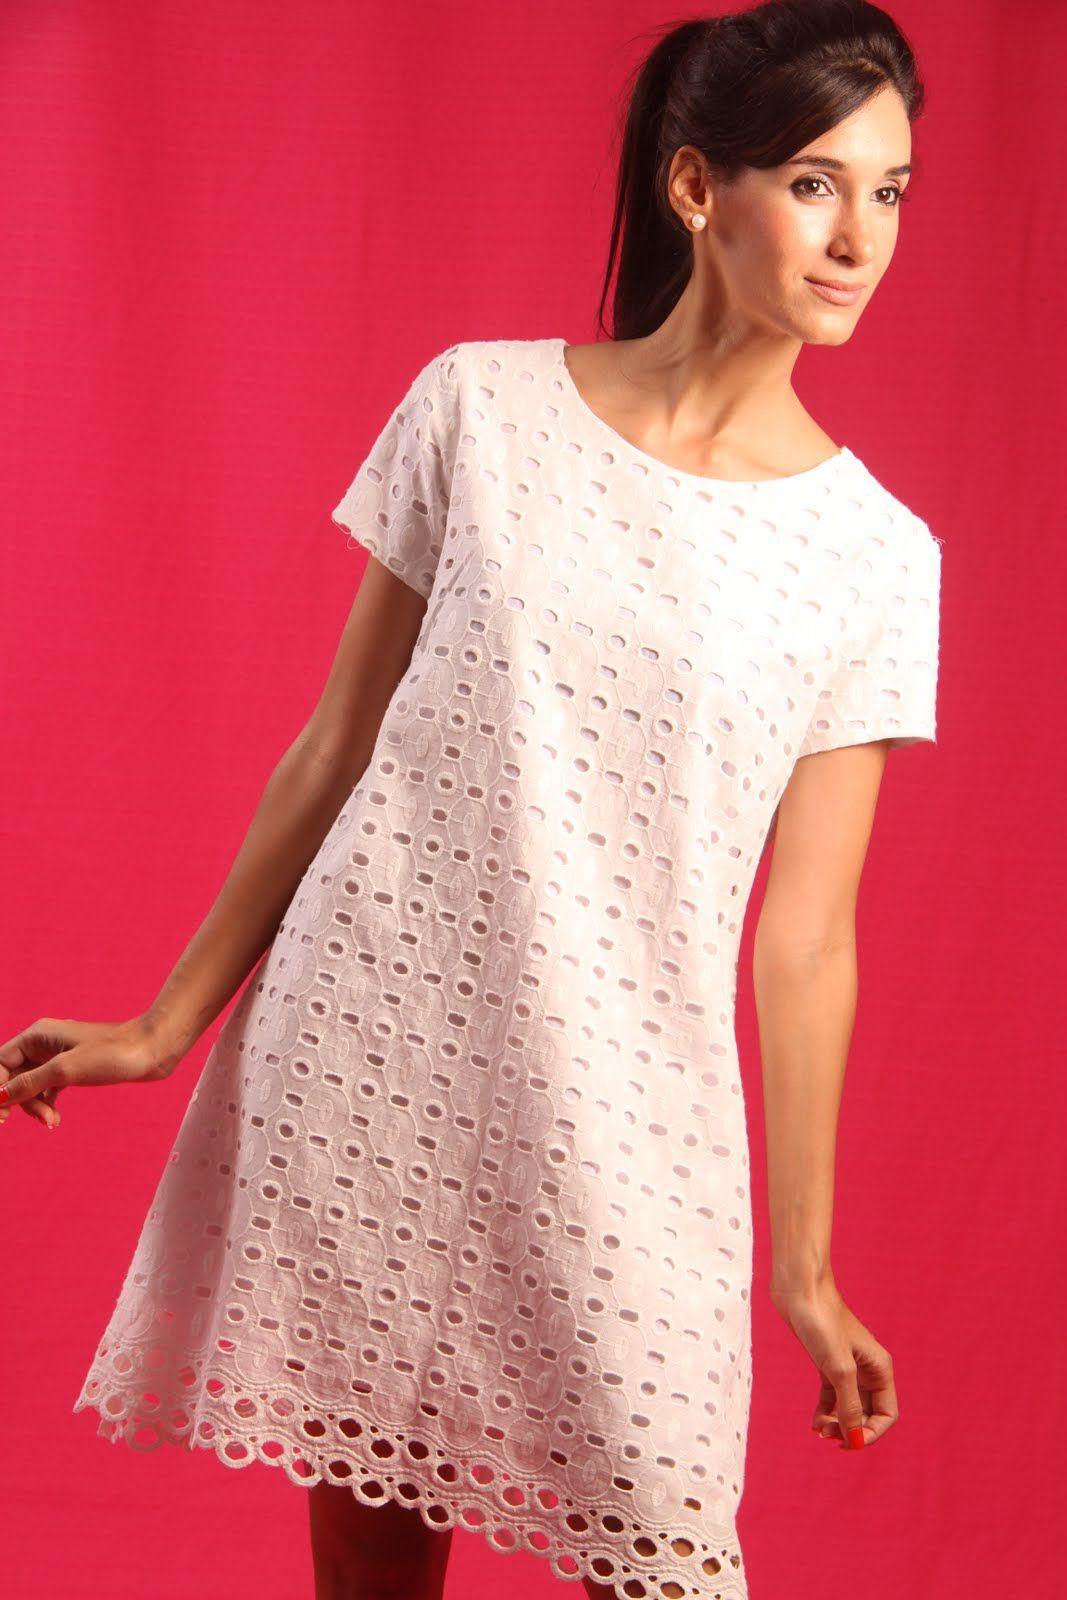 fa109190d vestido de lese - Pesquisa Google Modelos De Vestidos Brancos, Vestidos De  Algodão, Vestidos